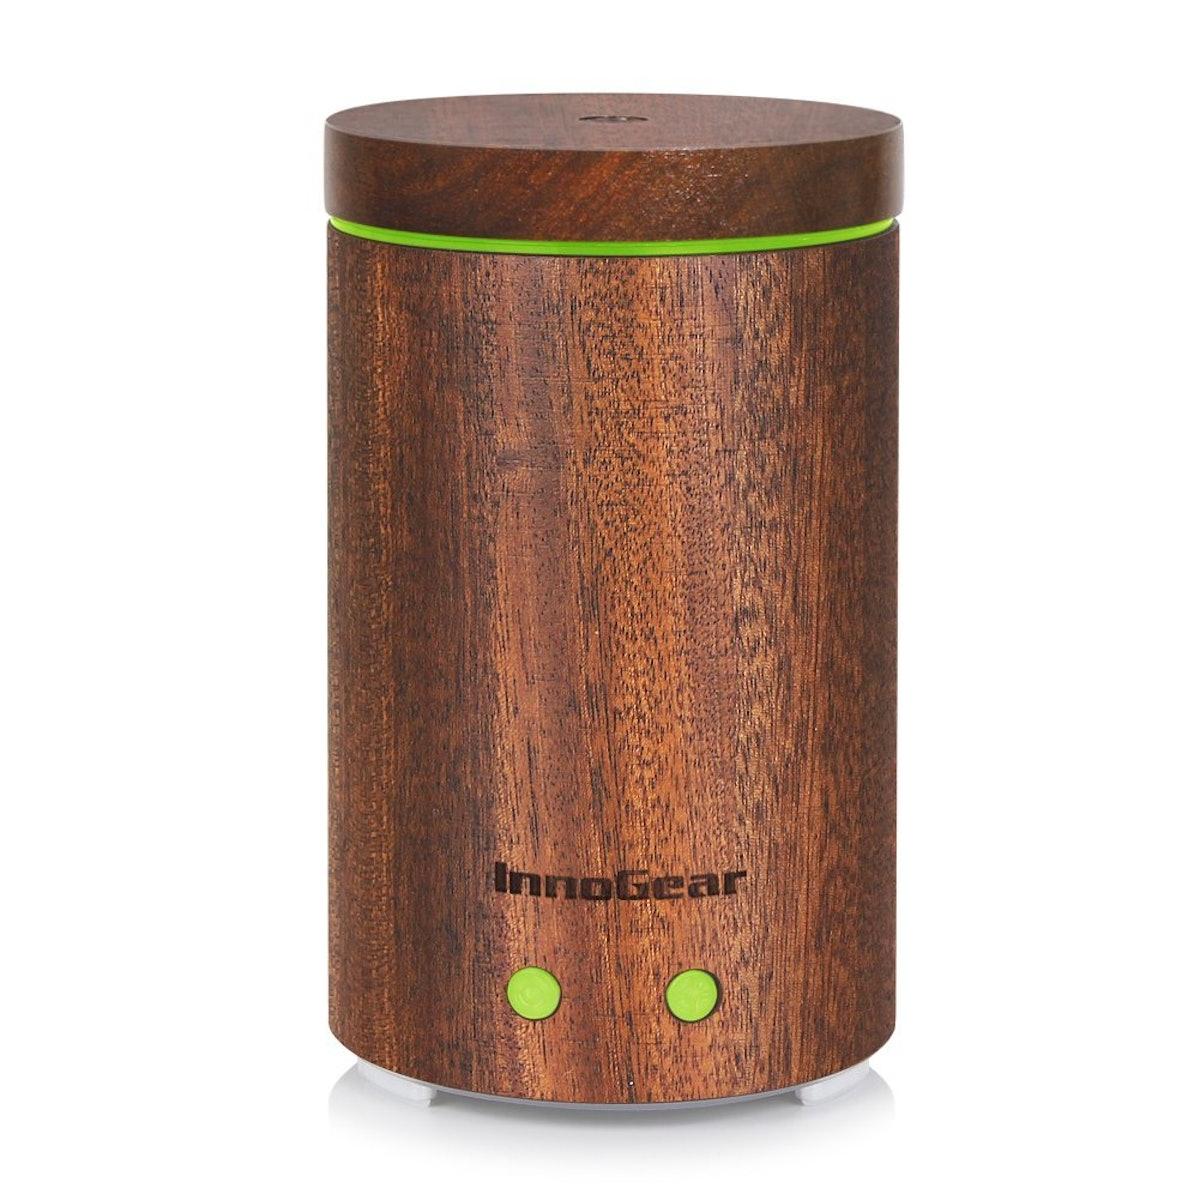 InnoGear Real Wood Essential Oil Diffuser